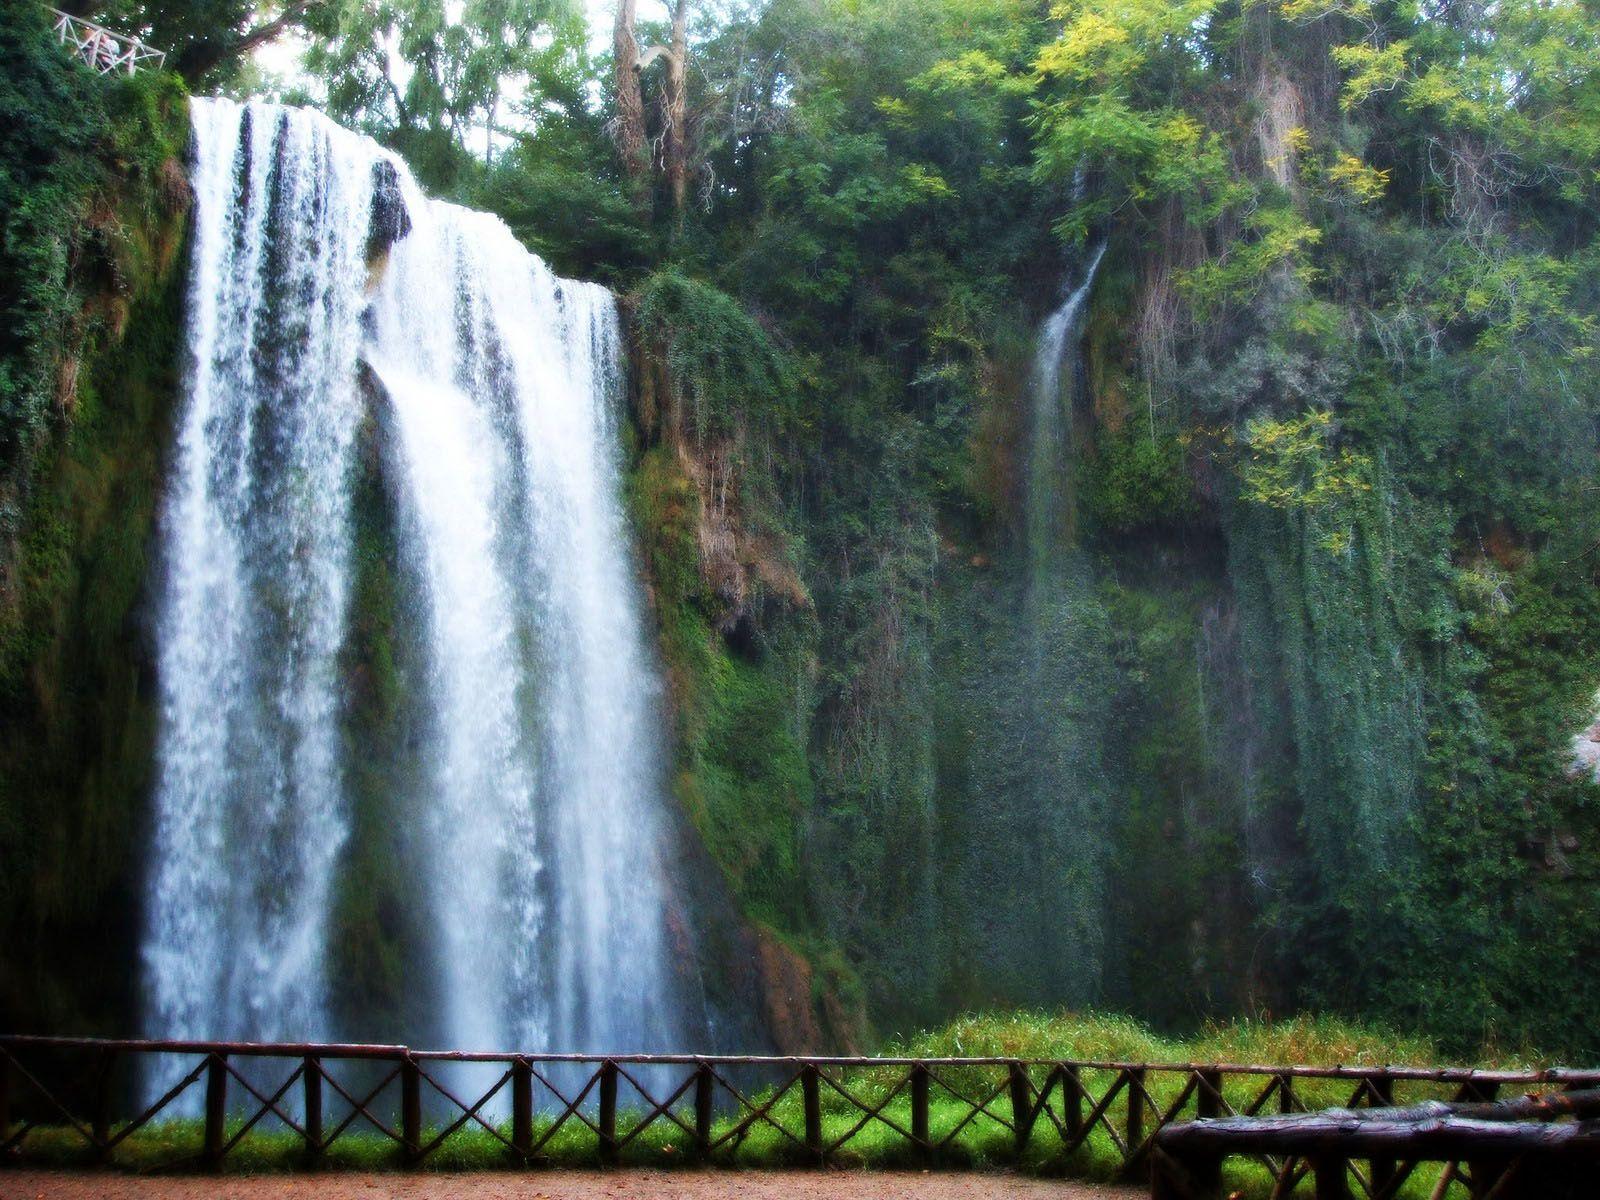 Cascada de cola de caballo en el parque natural del for Cascadas con piedras naturales